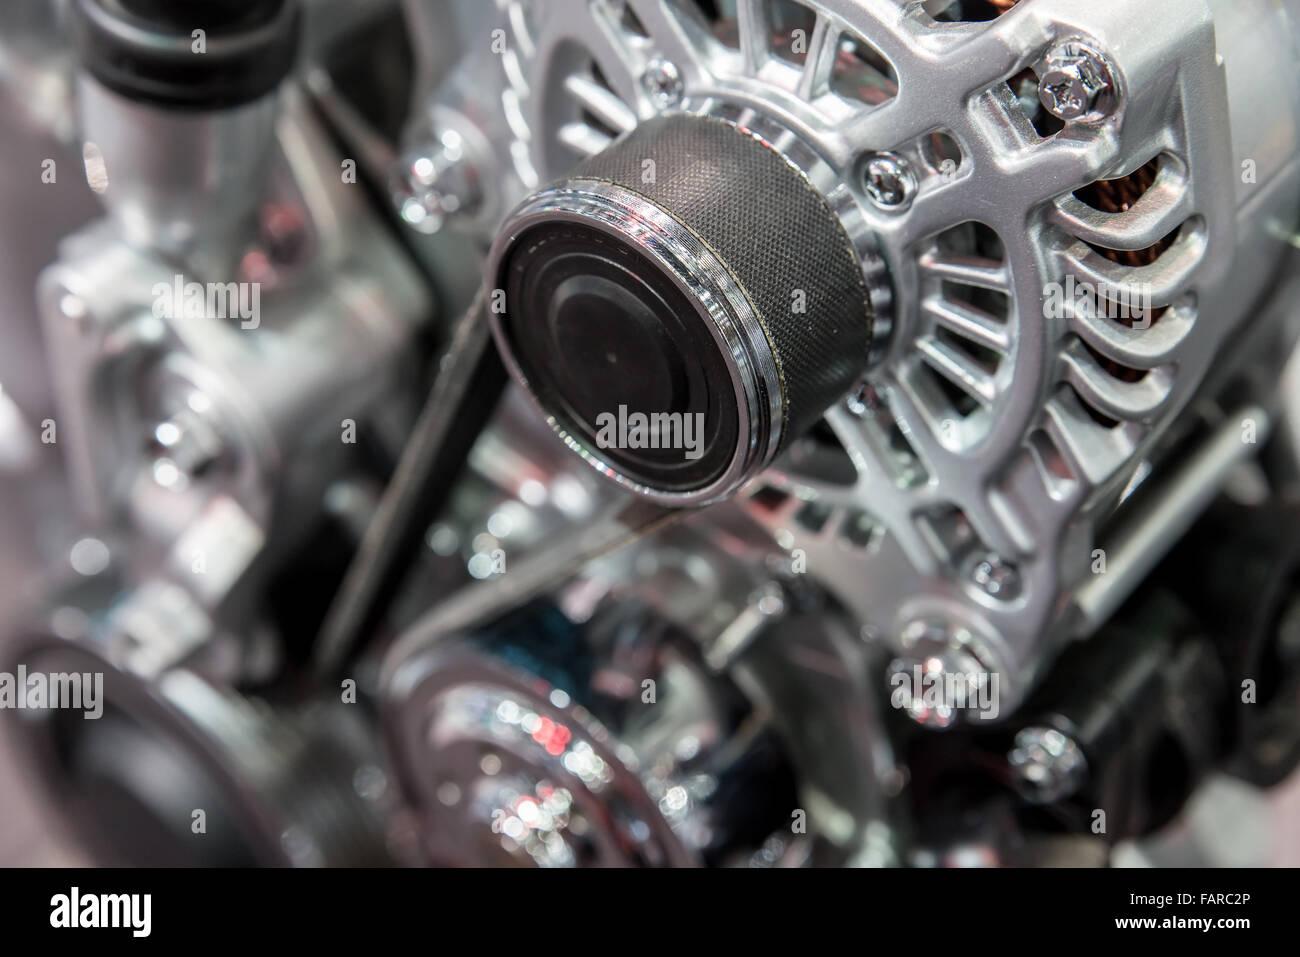 Hydrogen Device Stockfotos & Hydrogen Device Bilder - Alamy